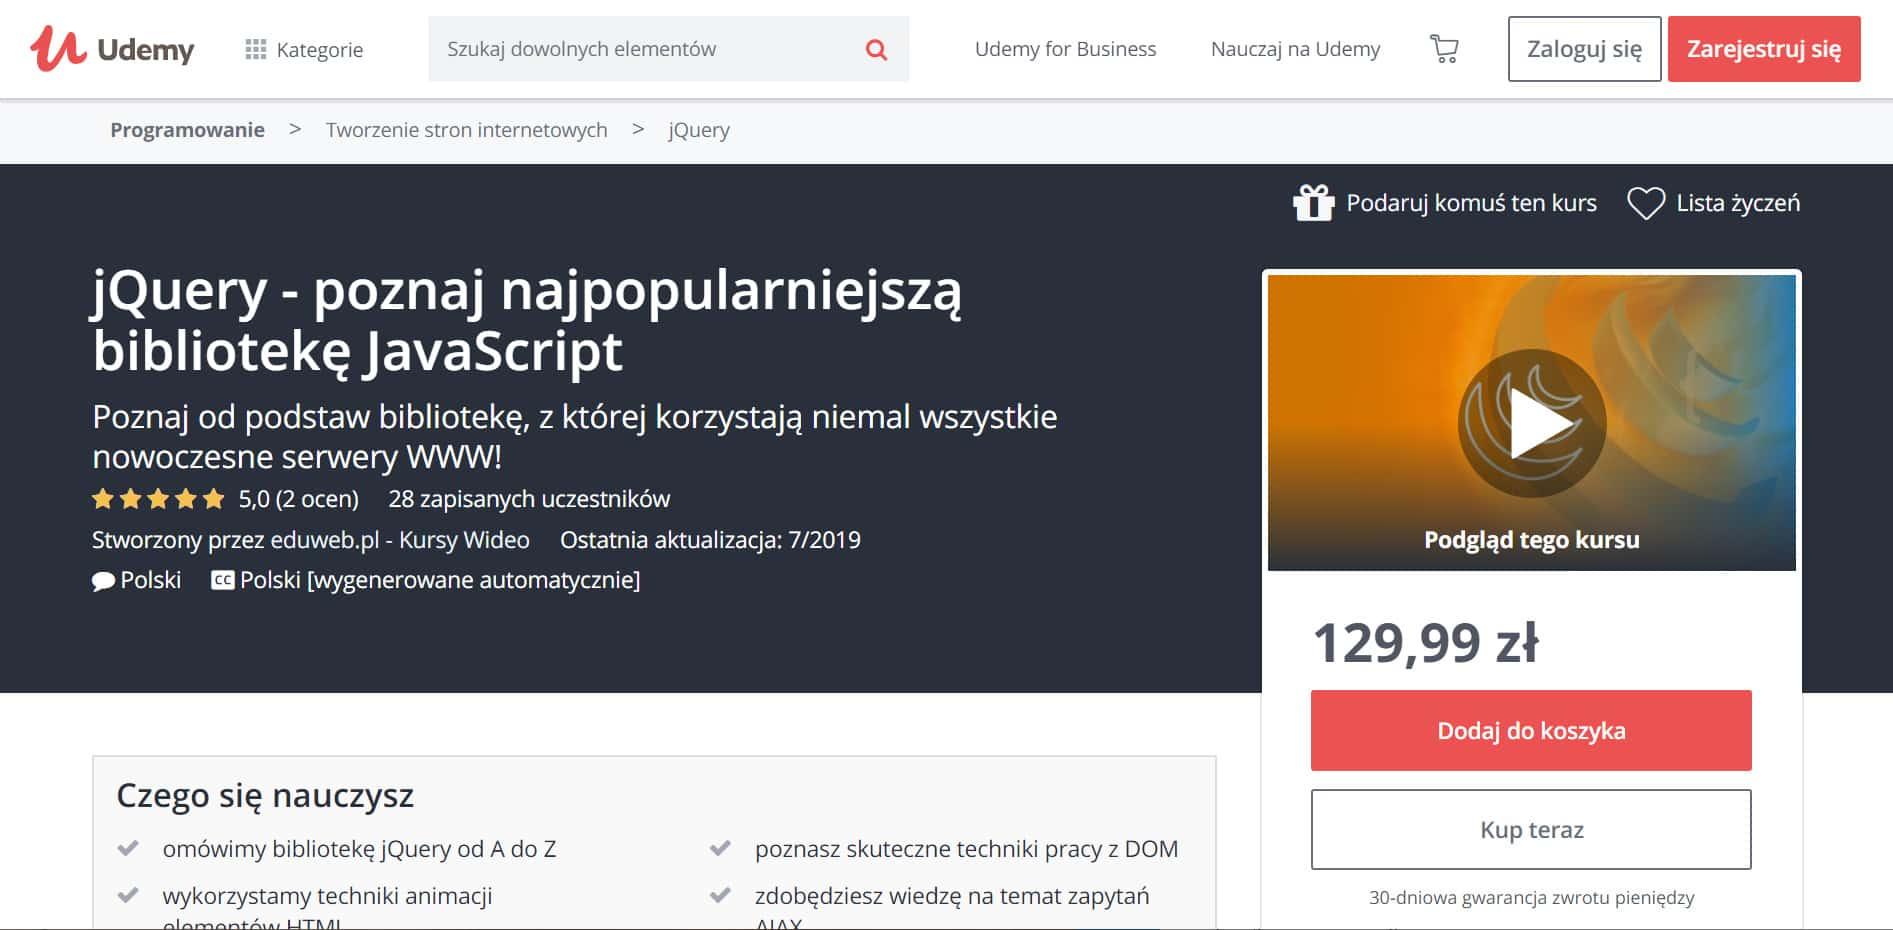 Udemy - jQuery - popularna biblioteka JavaScript